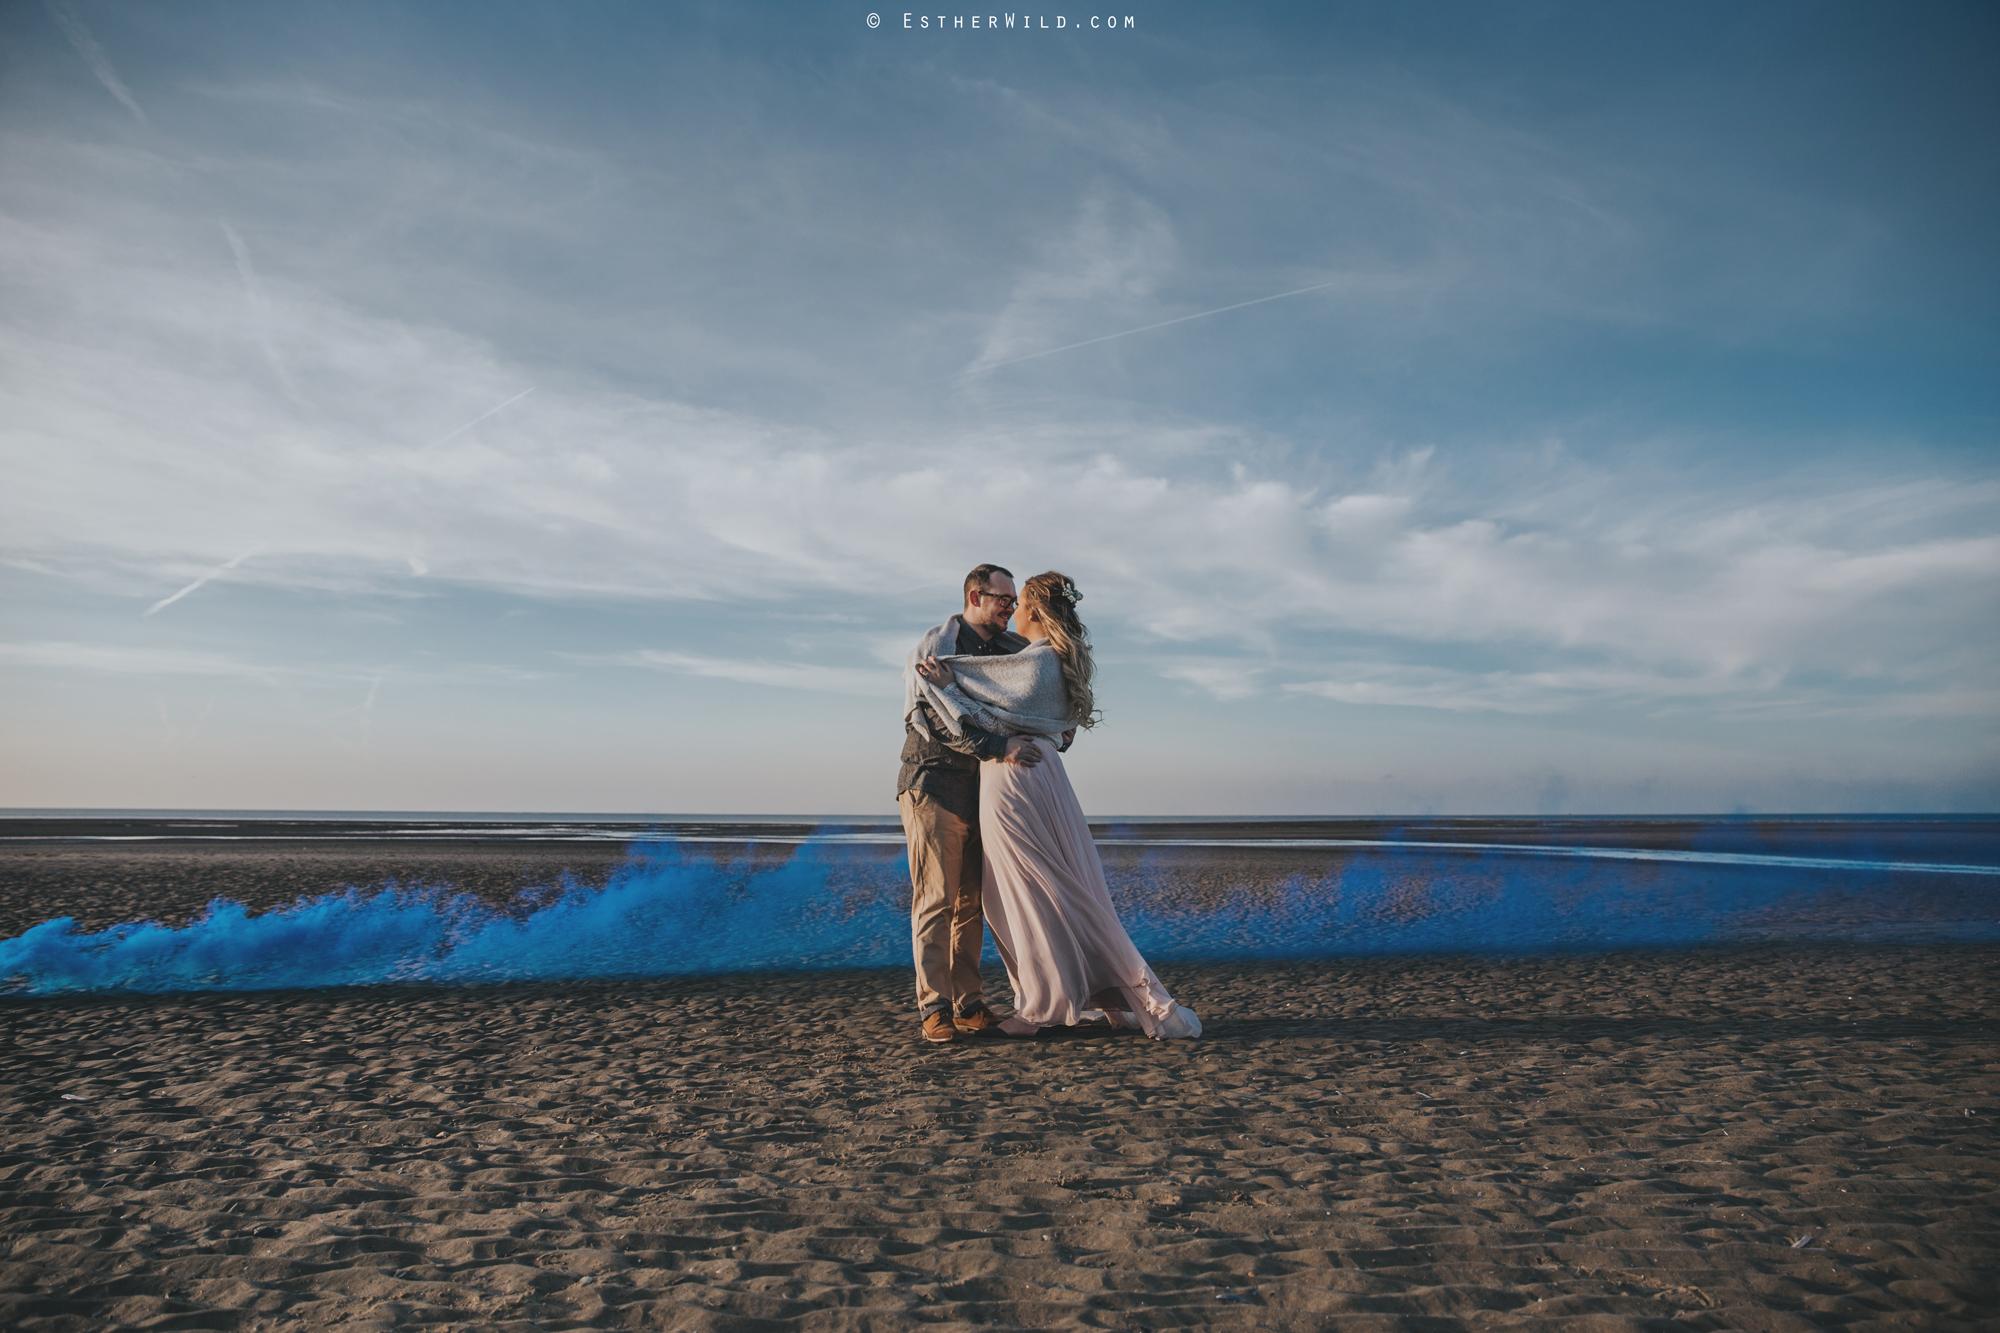 Couple_Anniversary_Wedding_Photography_Hunstanton_Norfolk_Esther_Wild_Share_Copy_IMG_8849.jpg